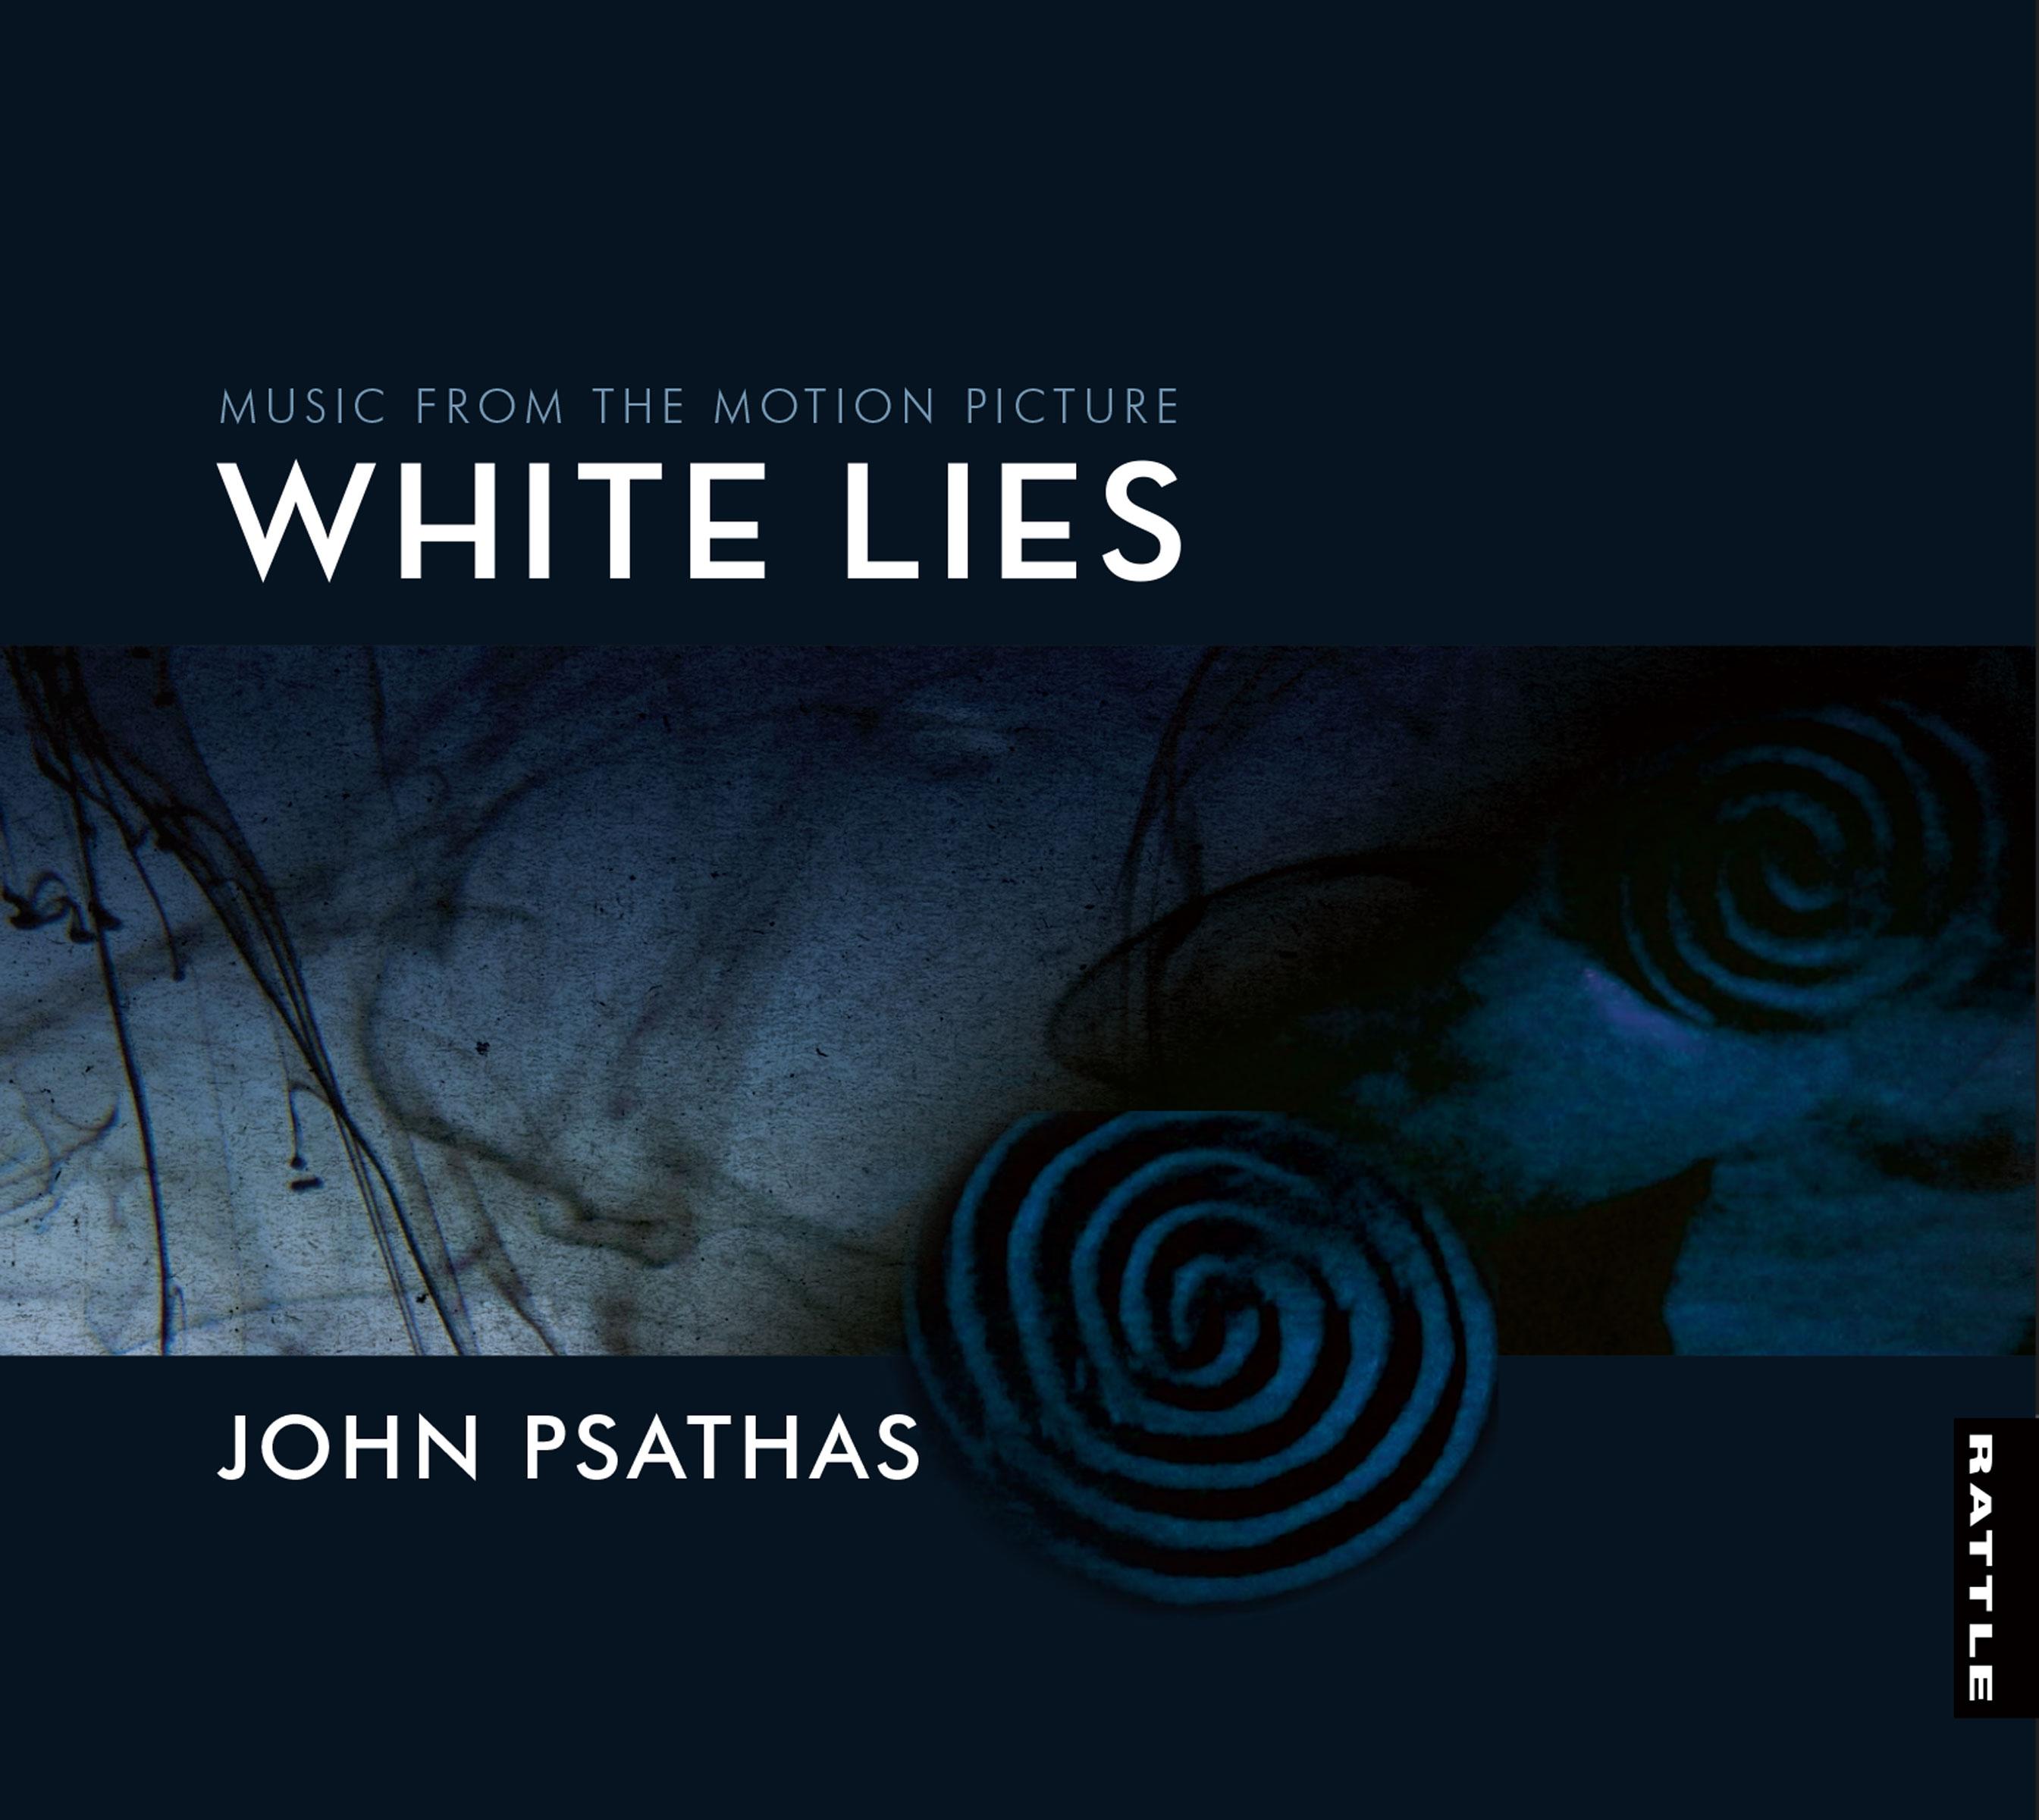 John Psathas | White Lies - downloadable MP3 ALBUM